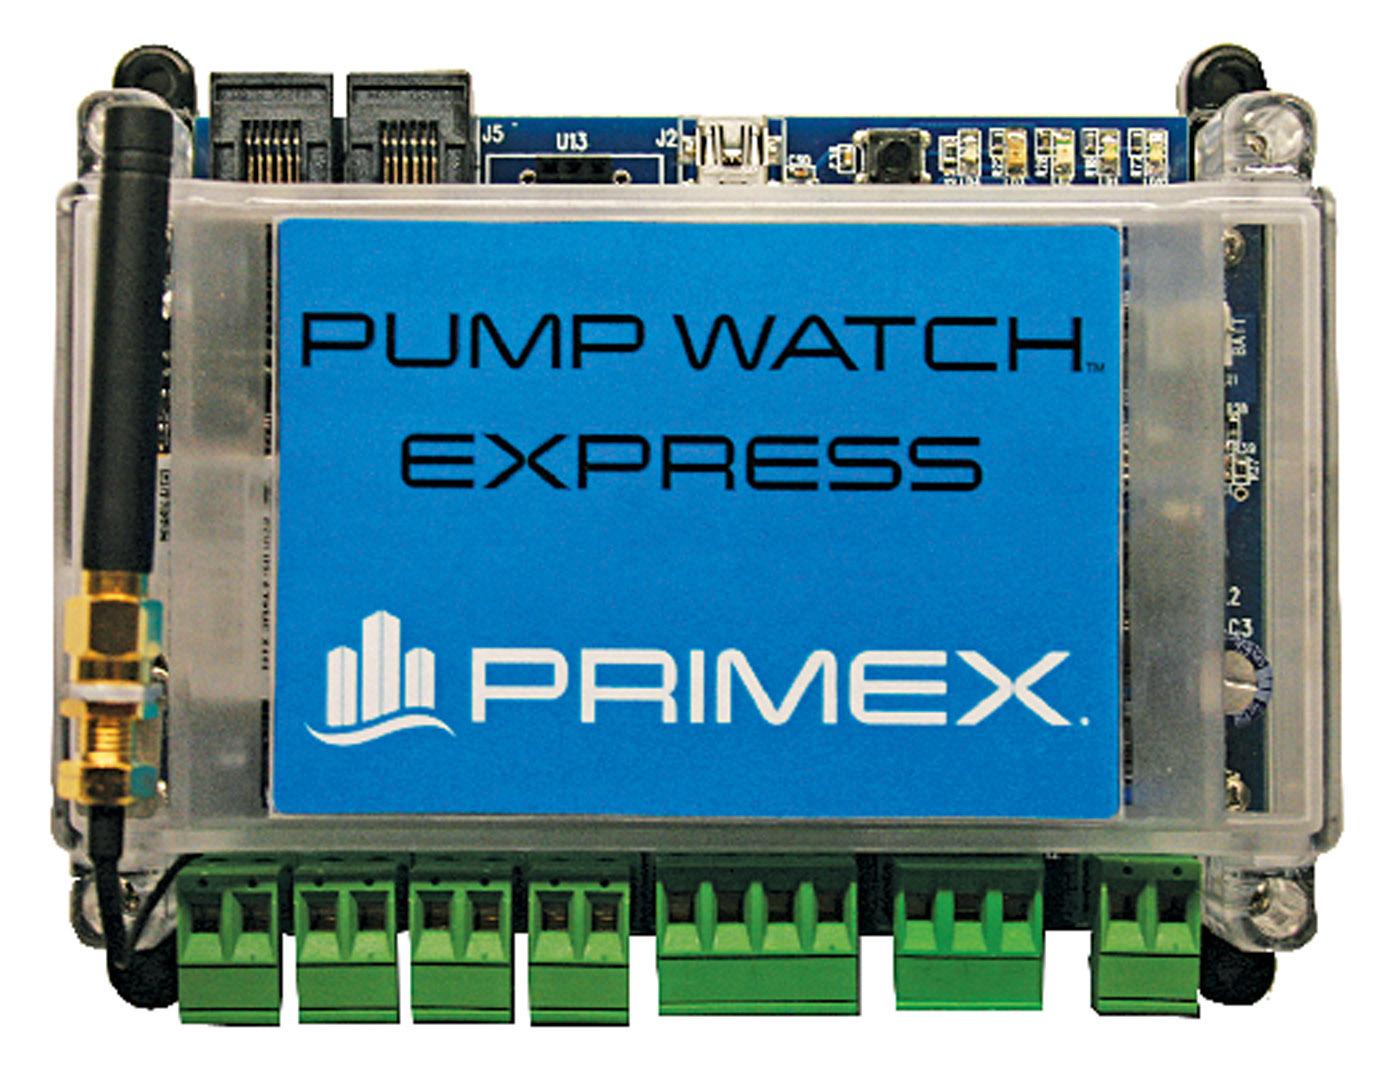 Pump Watch Express from PRIMEX